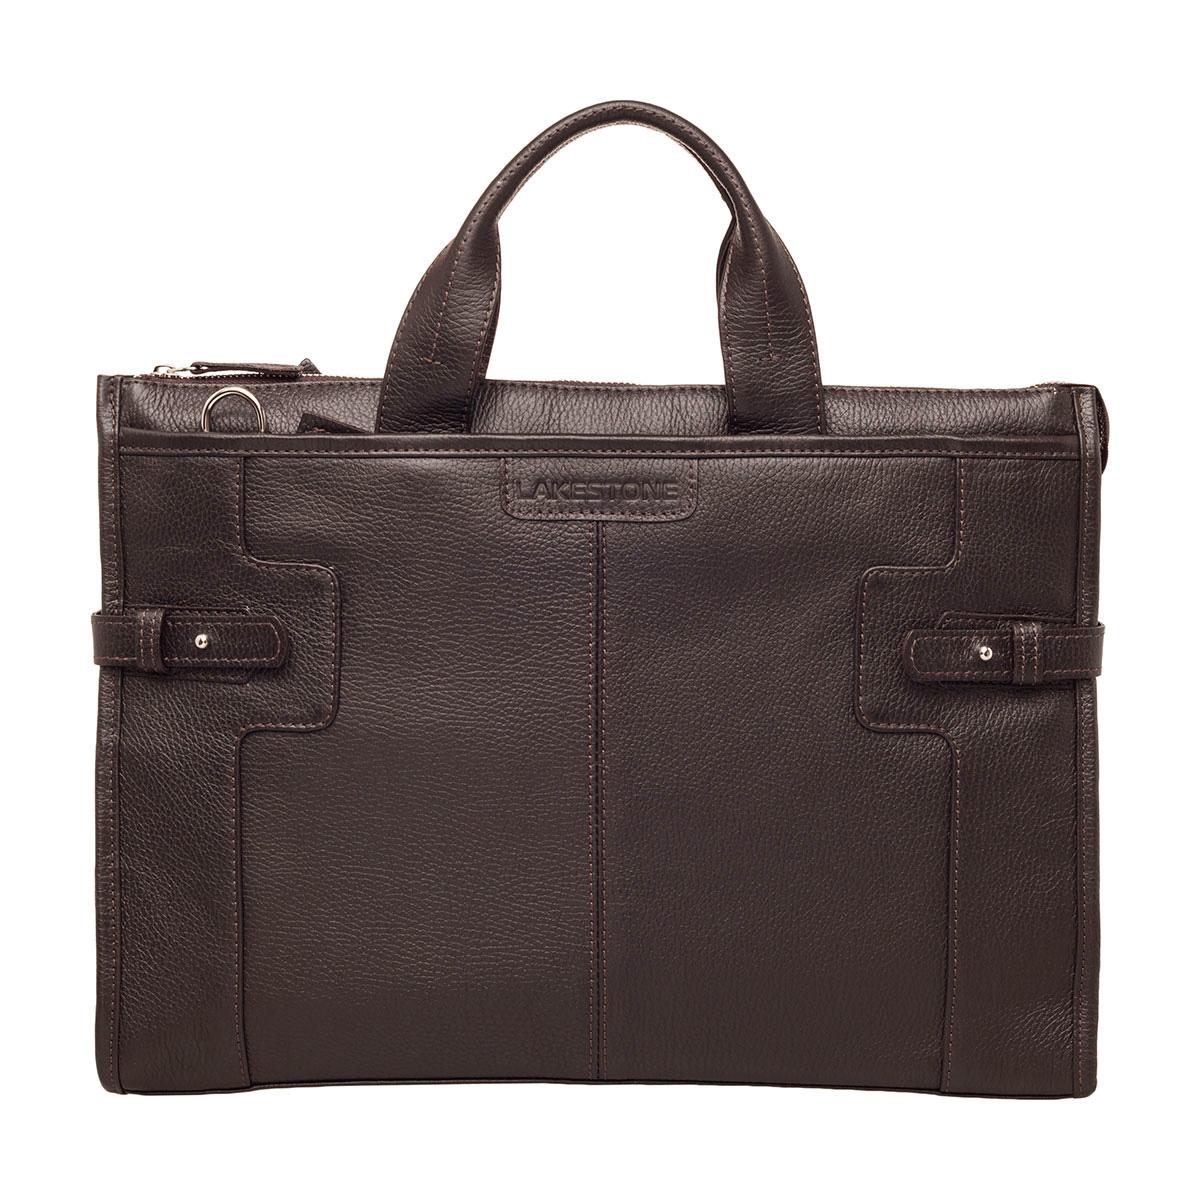 Деловая сумка Courtney Brown фото